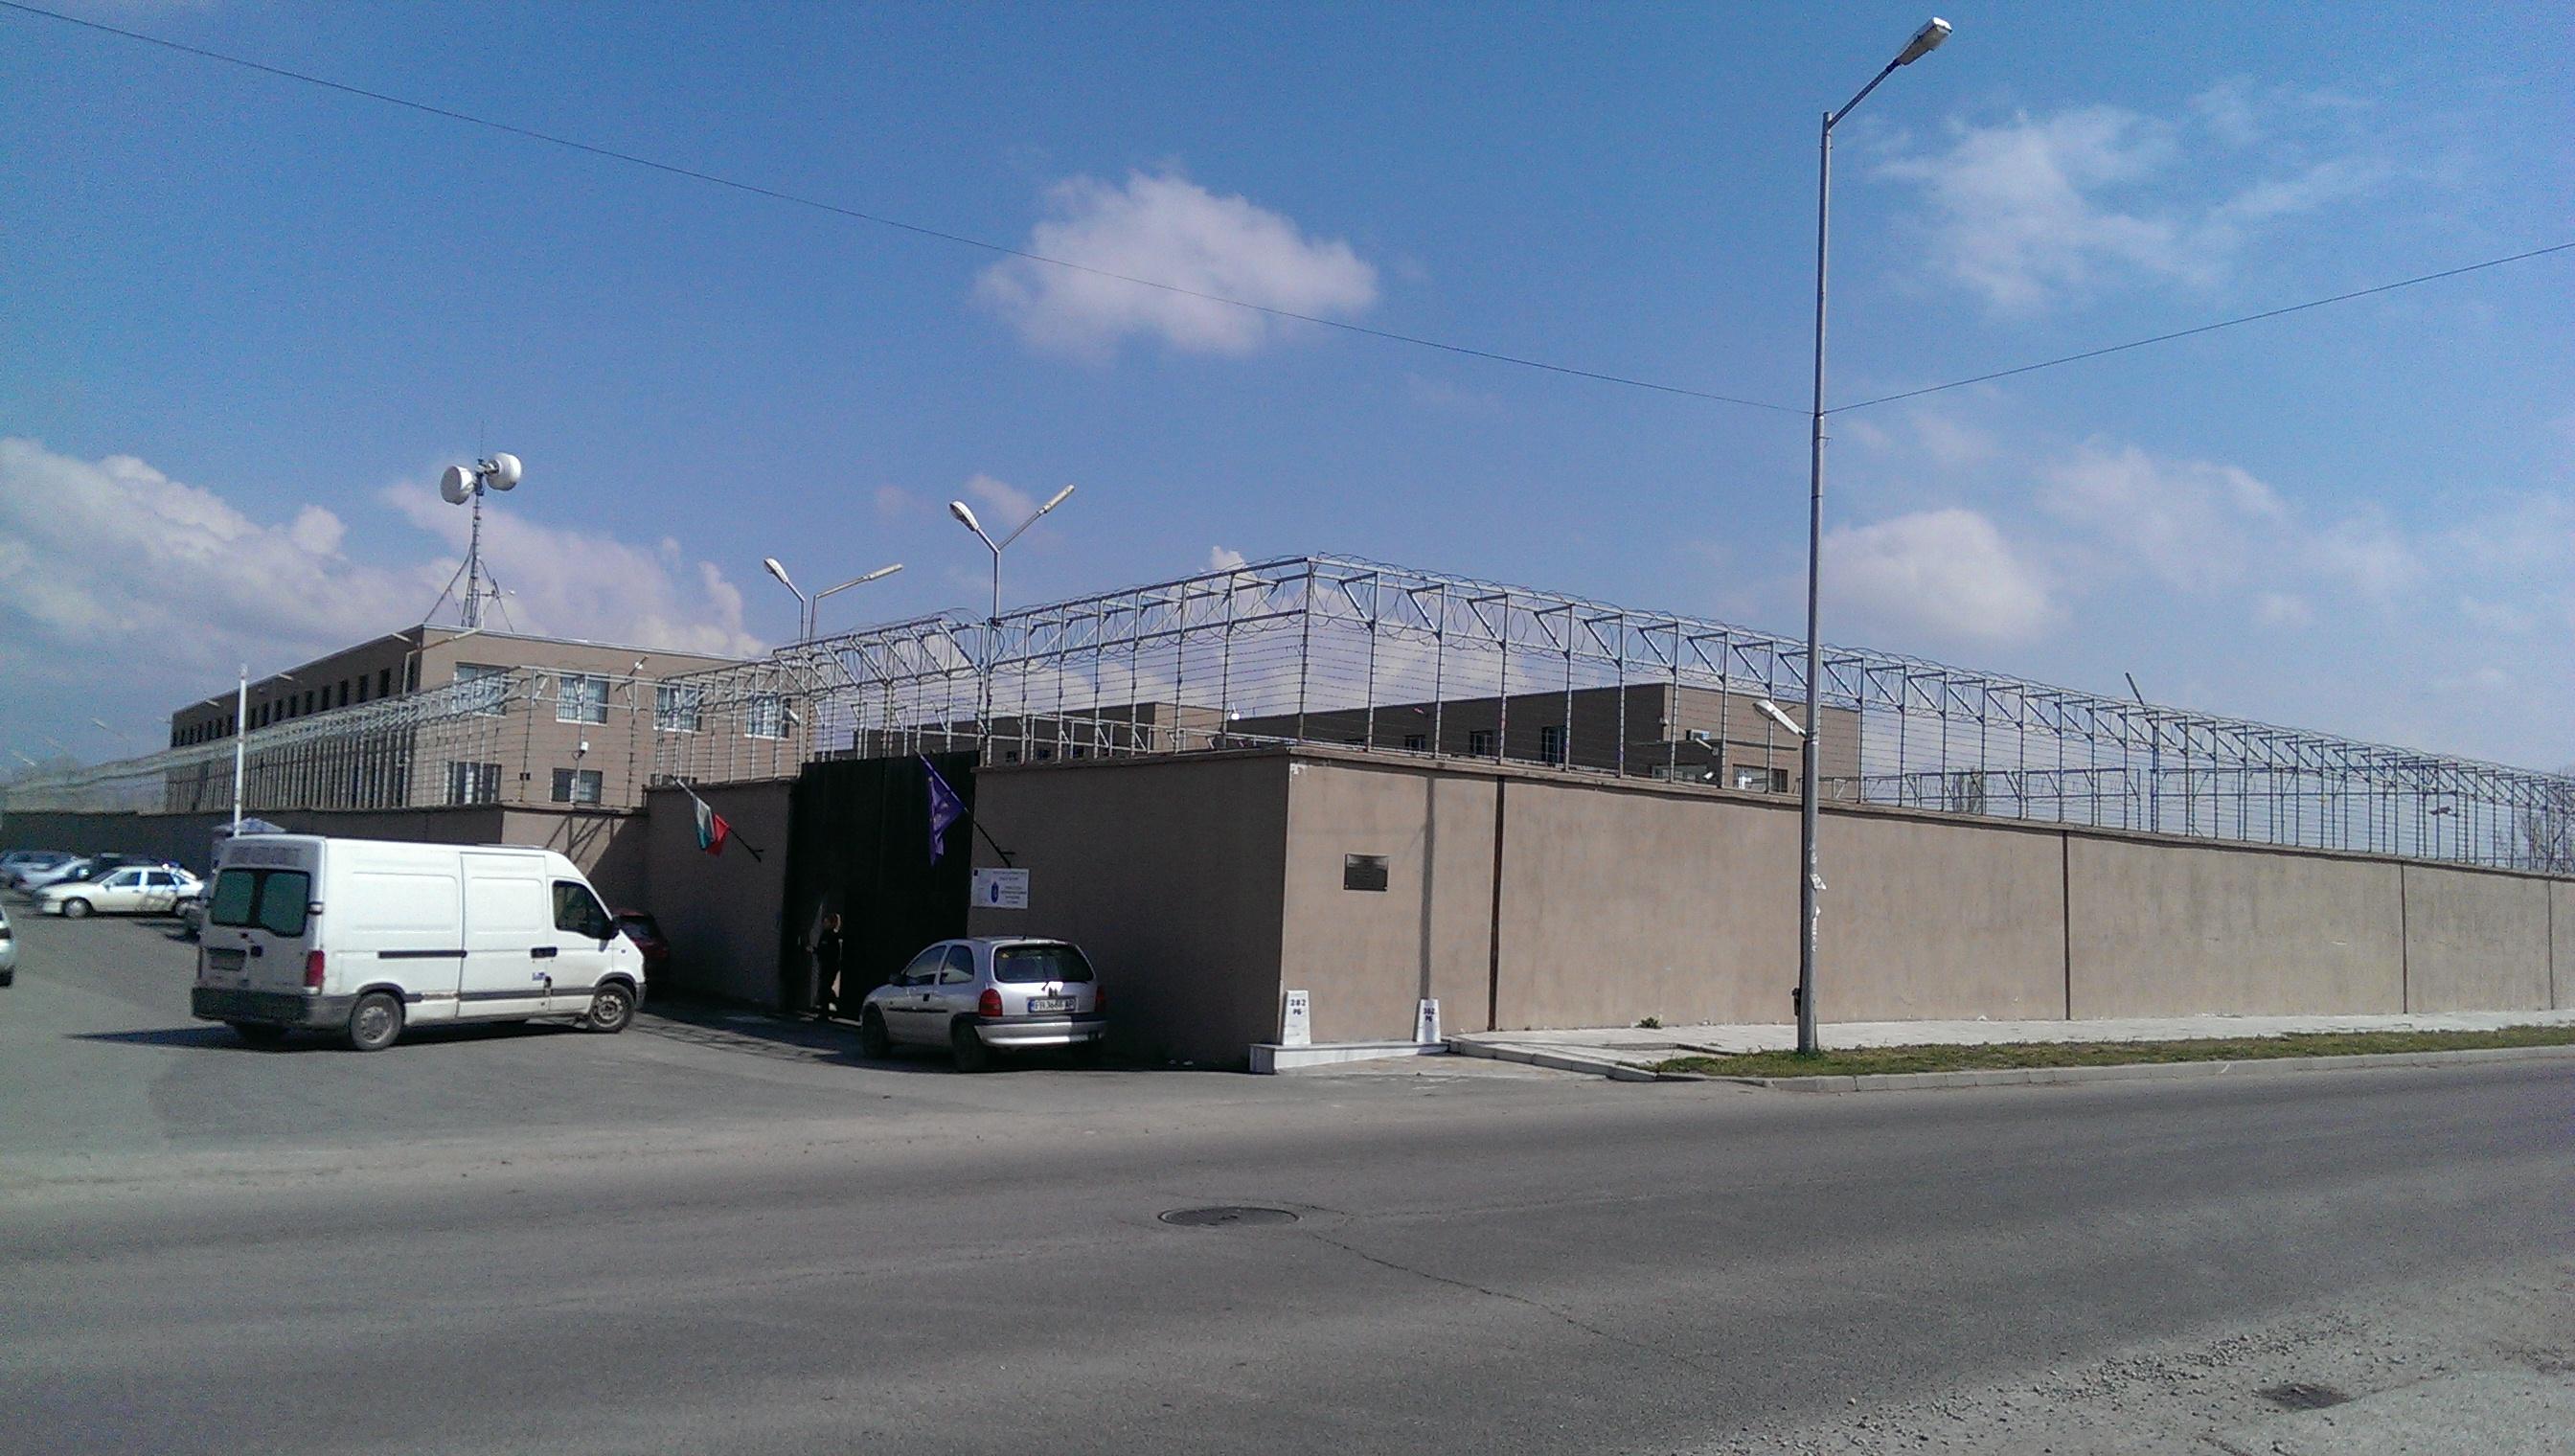 Lyubimetz Detention Center - Bulgaria (PHOTO CREDIT: bordermonitoring.eu)